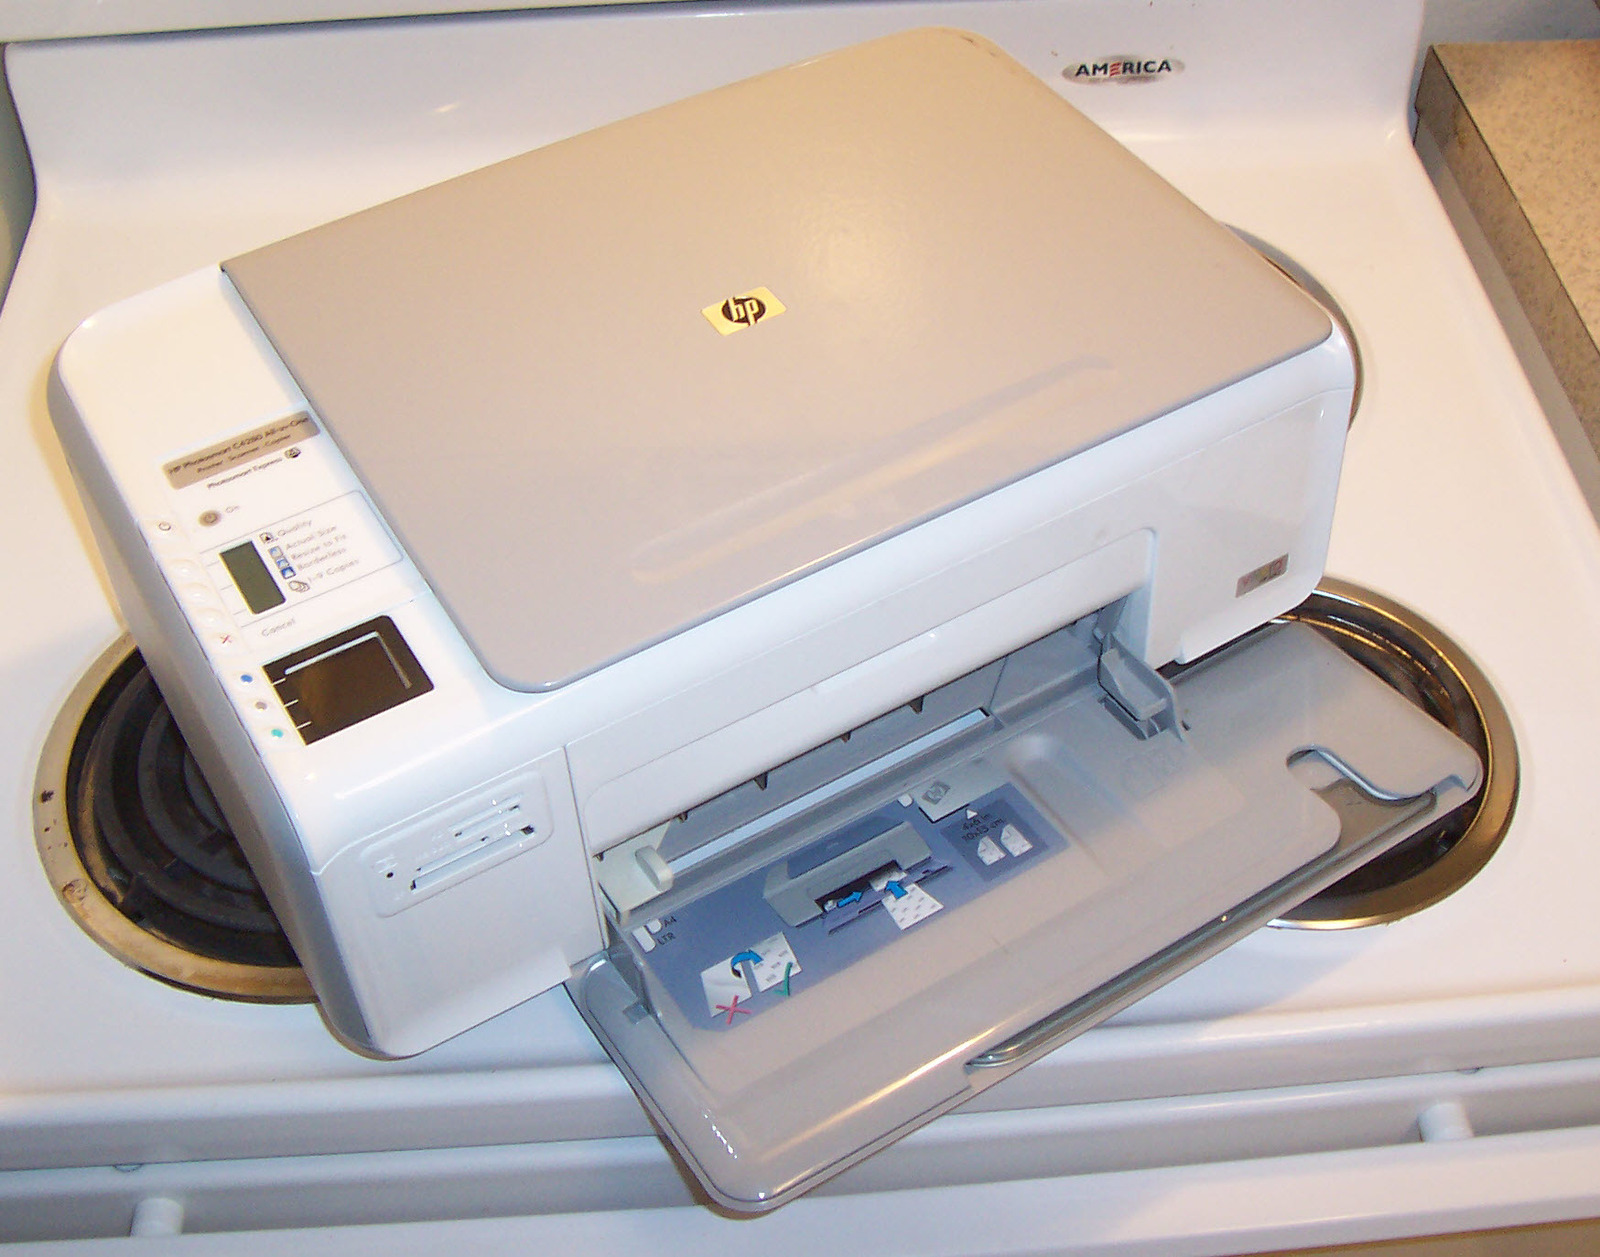 Mitigation Photos - A1 Radon Services, LLC Hp photosmart c4583 all in one printer